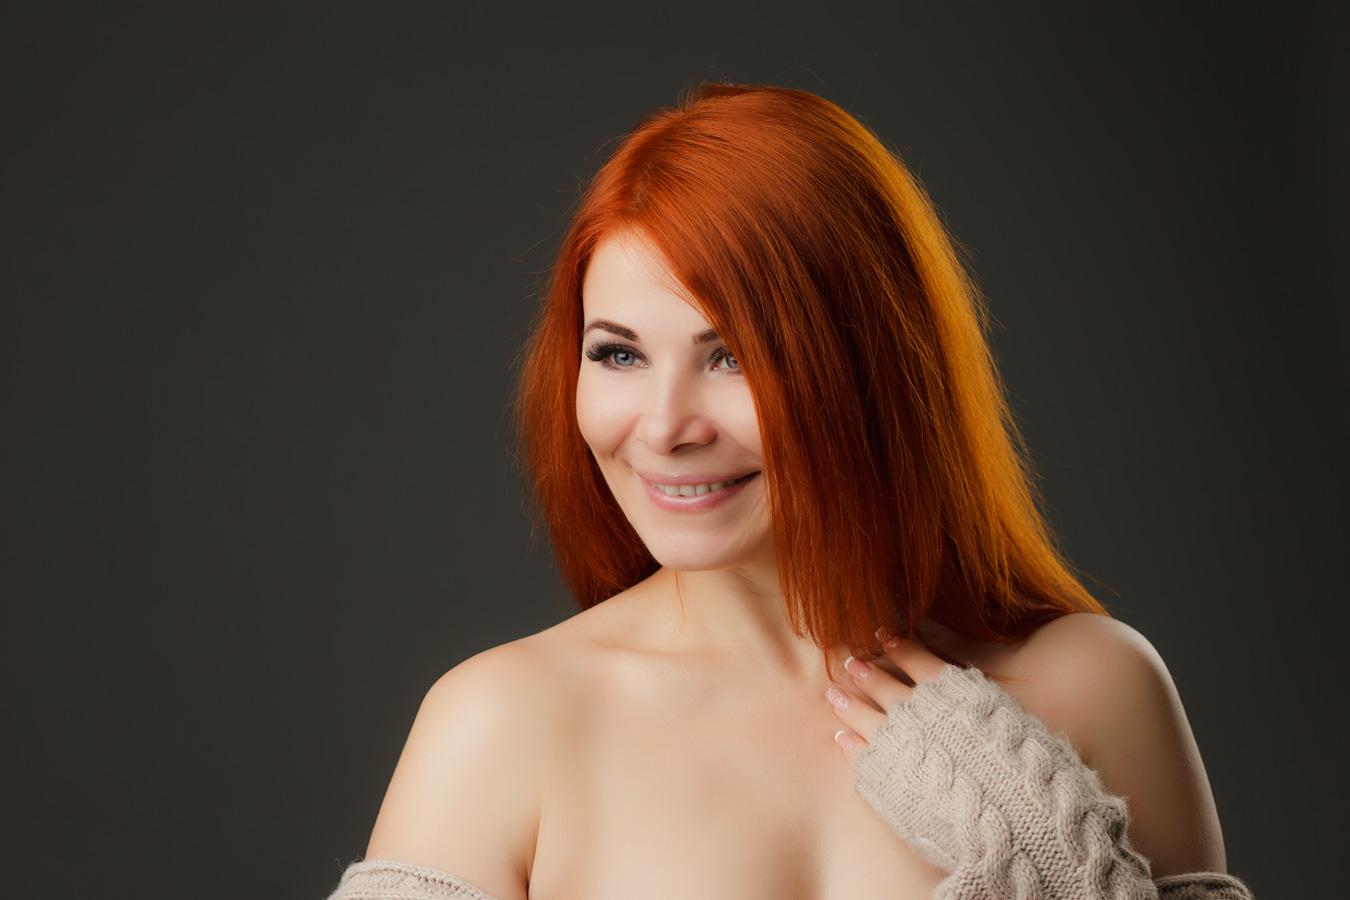 Ольга, студийная фотосъёмка, Абакан, фотограф Александр Зараменских